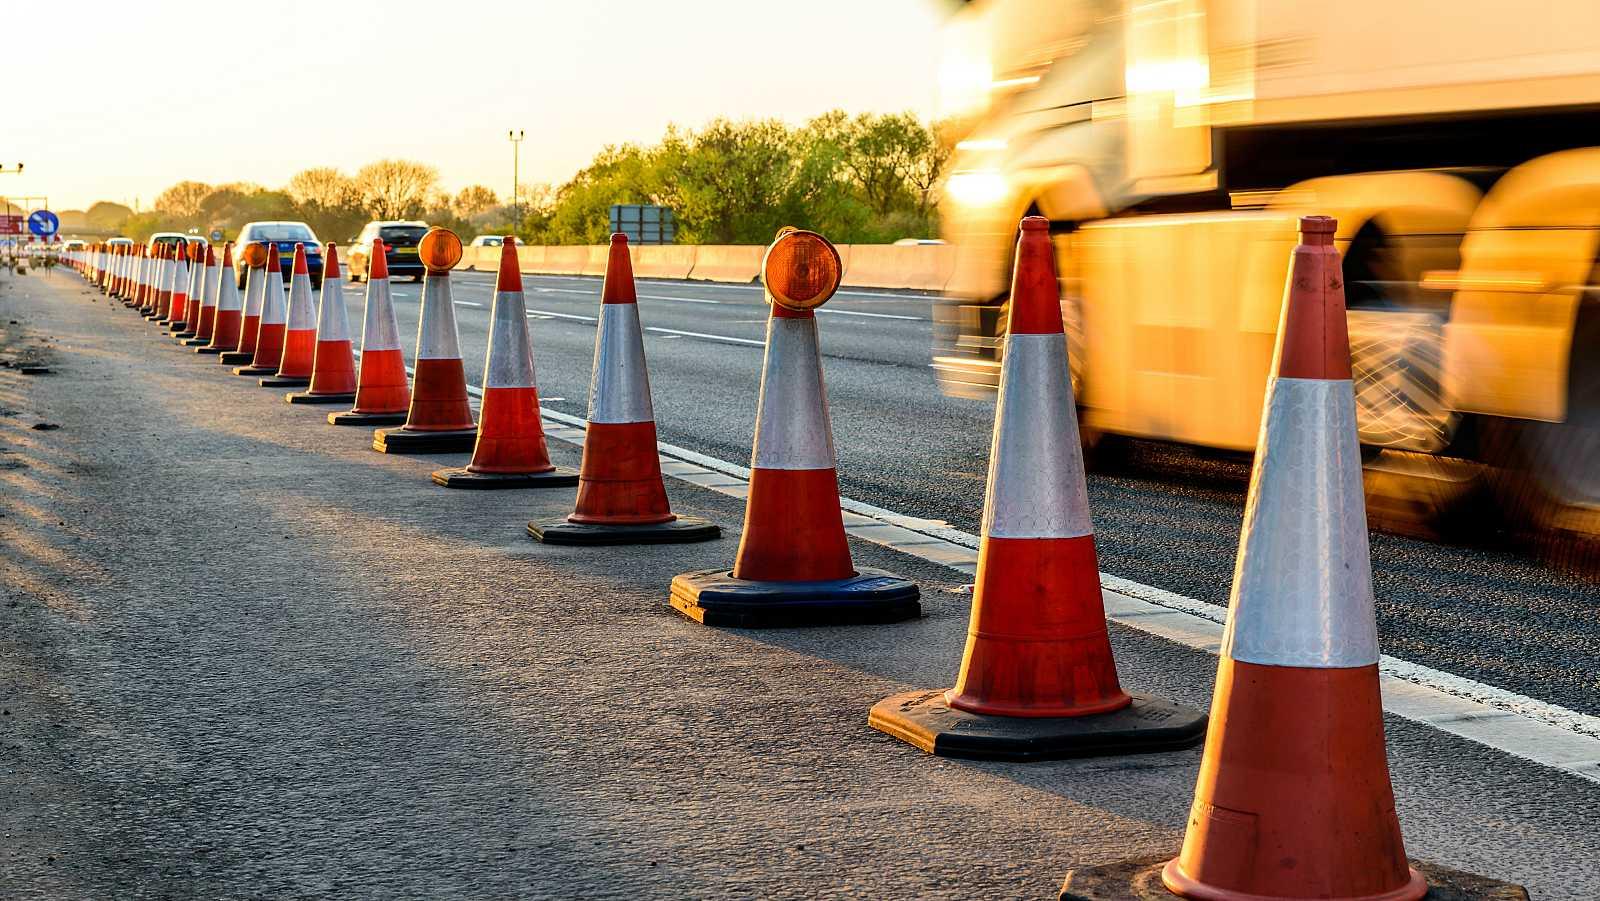 Autopista en obras.